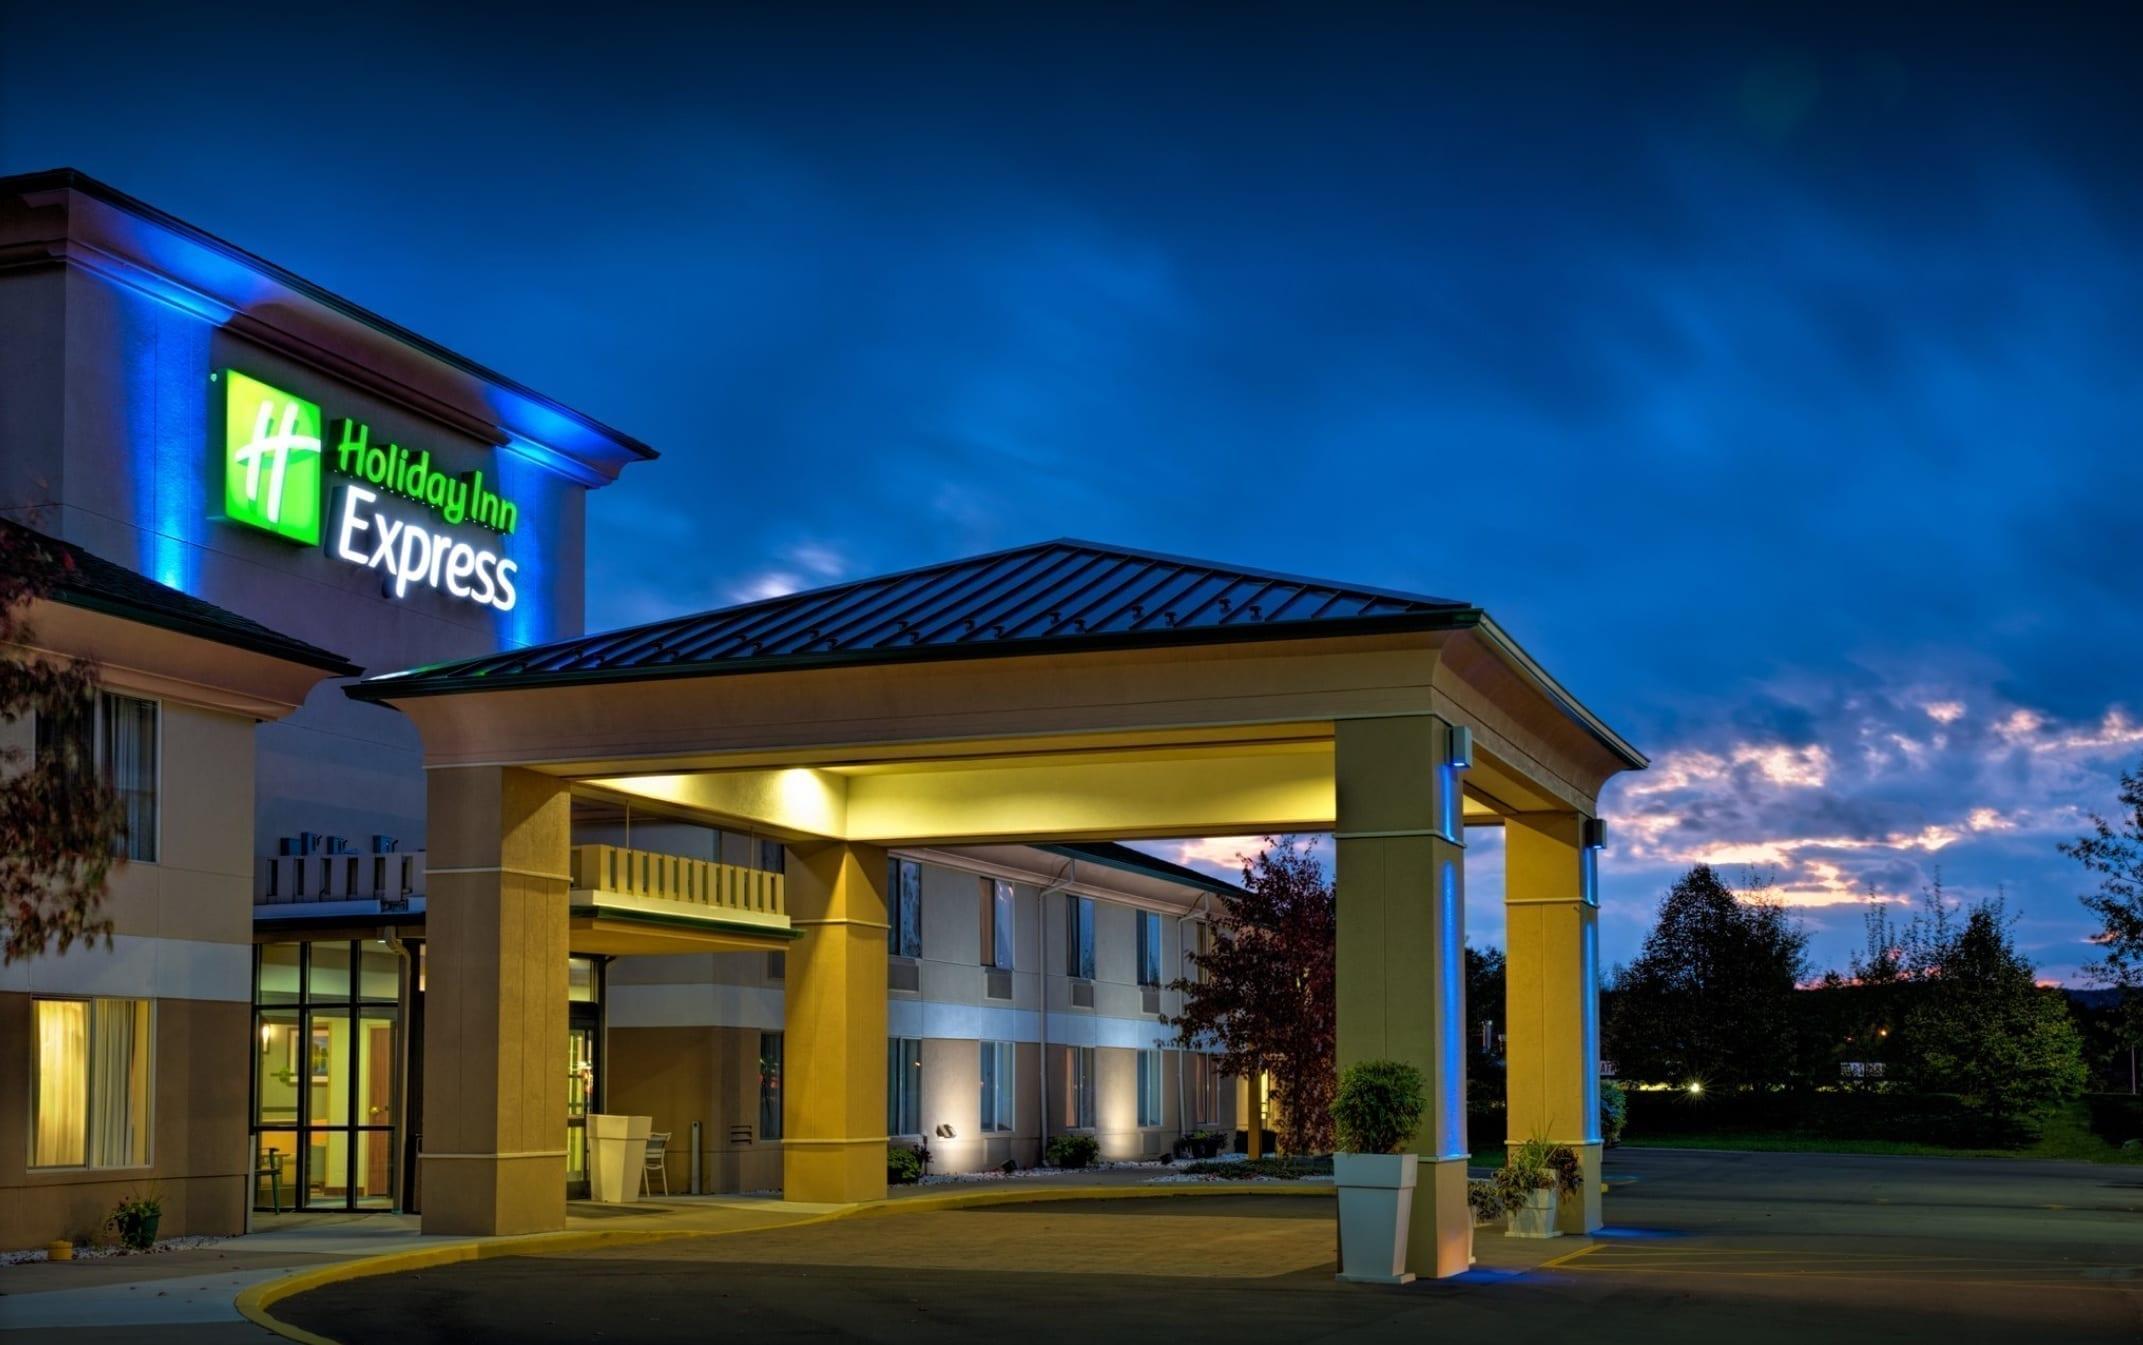 Holiday Inn Express by IHG - Salamanca, New York | MWT Hotel & Resort Architect